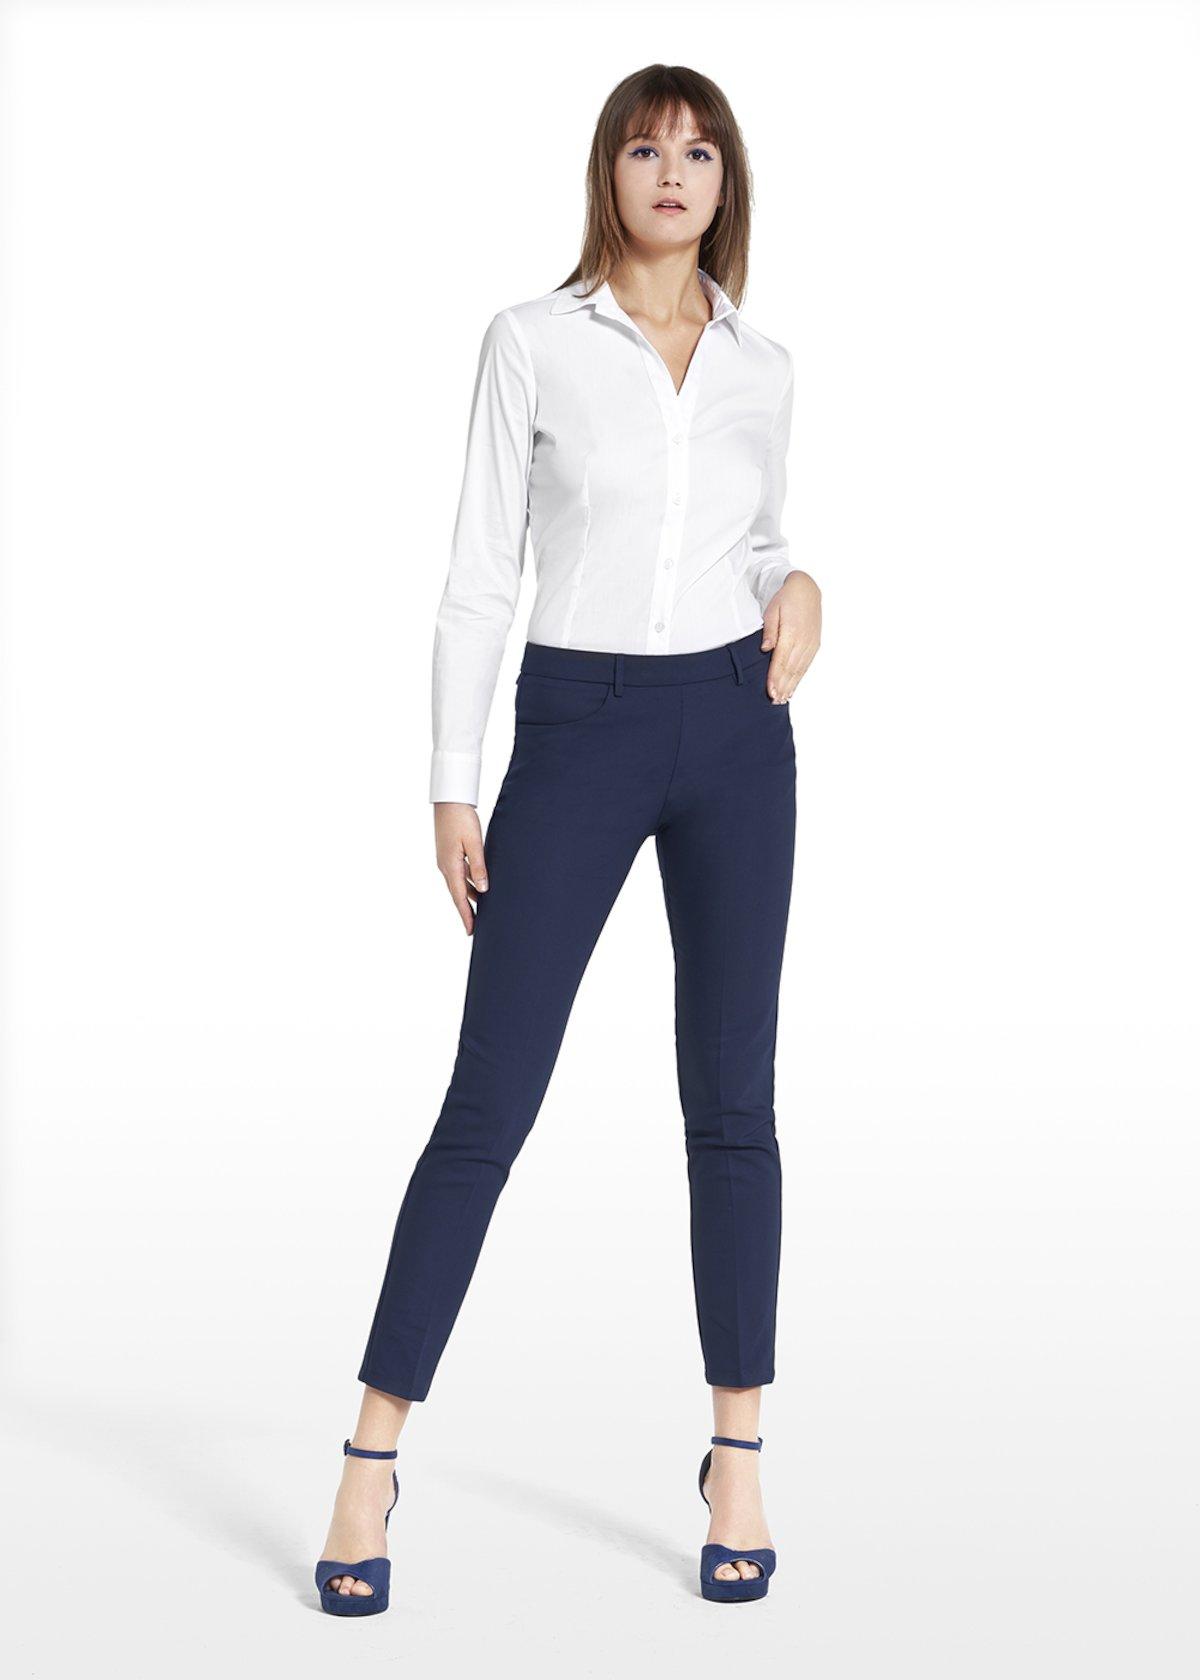 Equestrian pants Scarlett in technical fabric